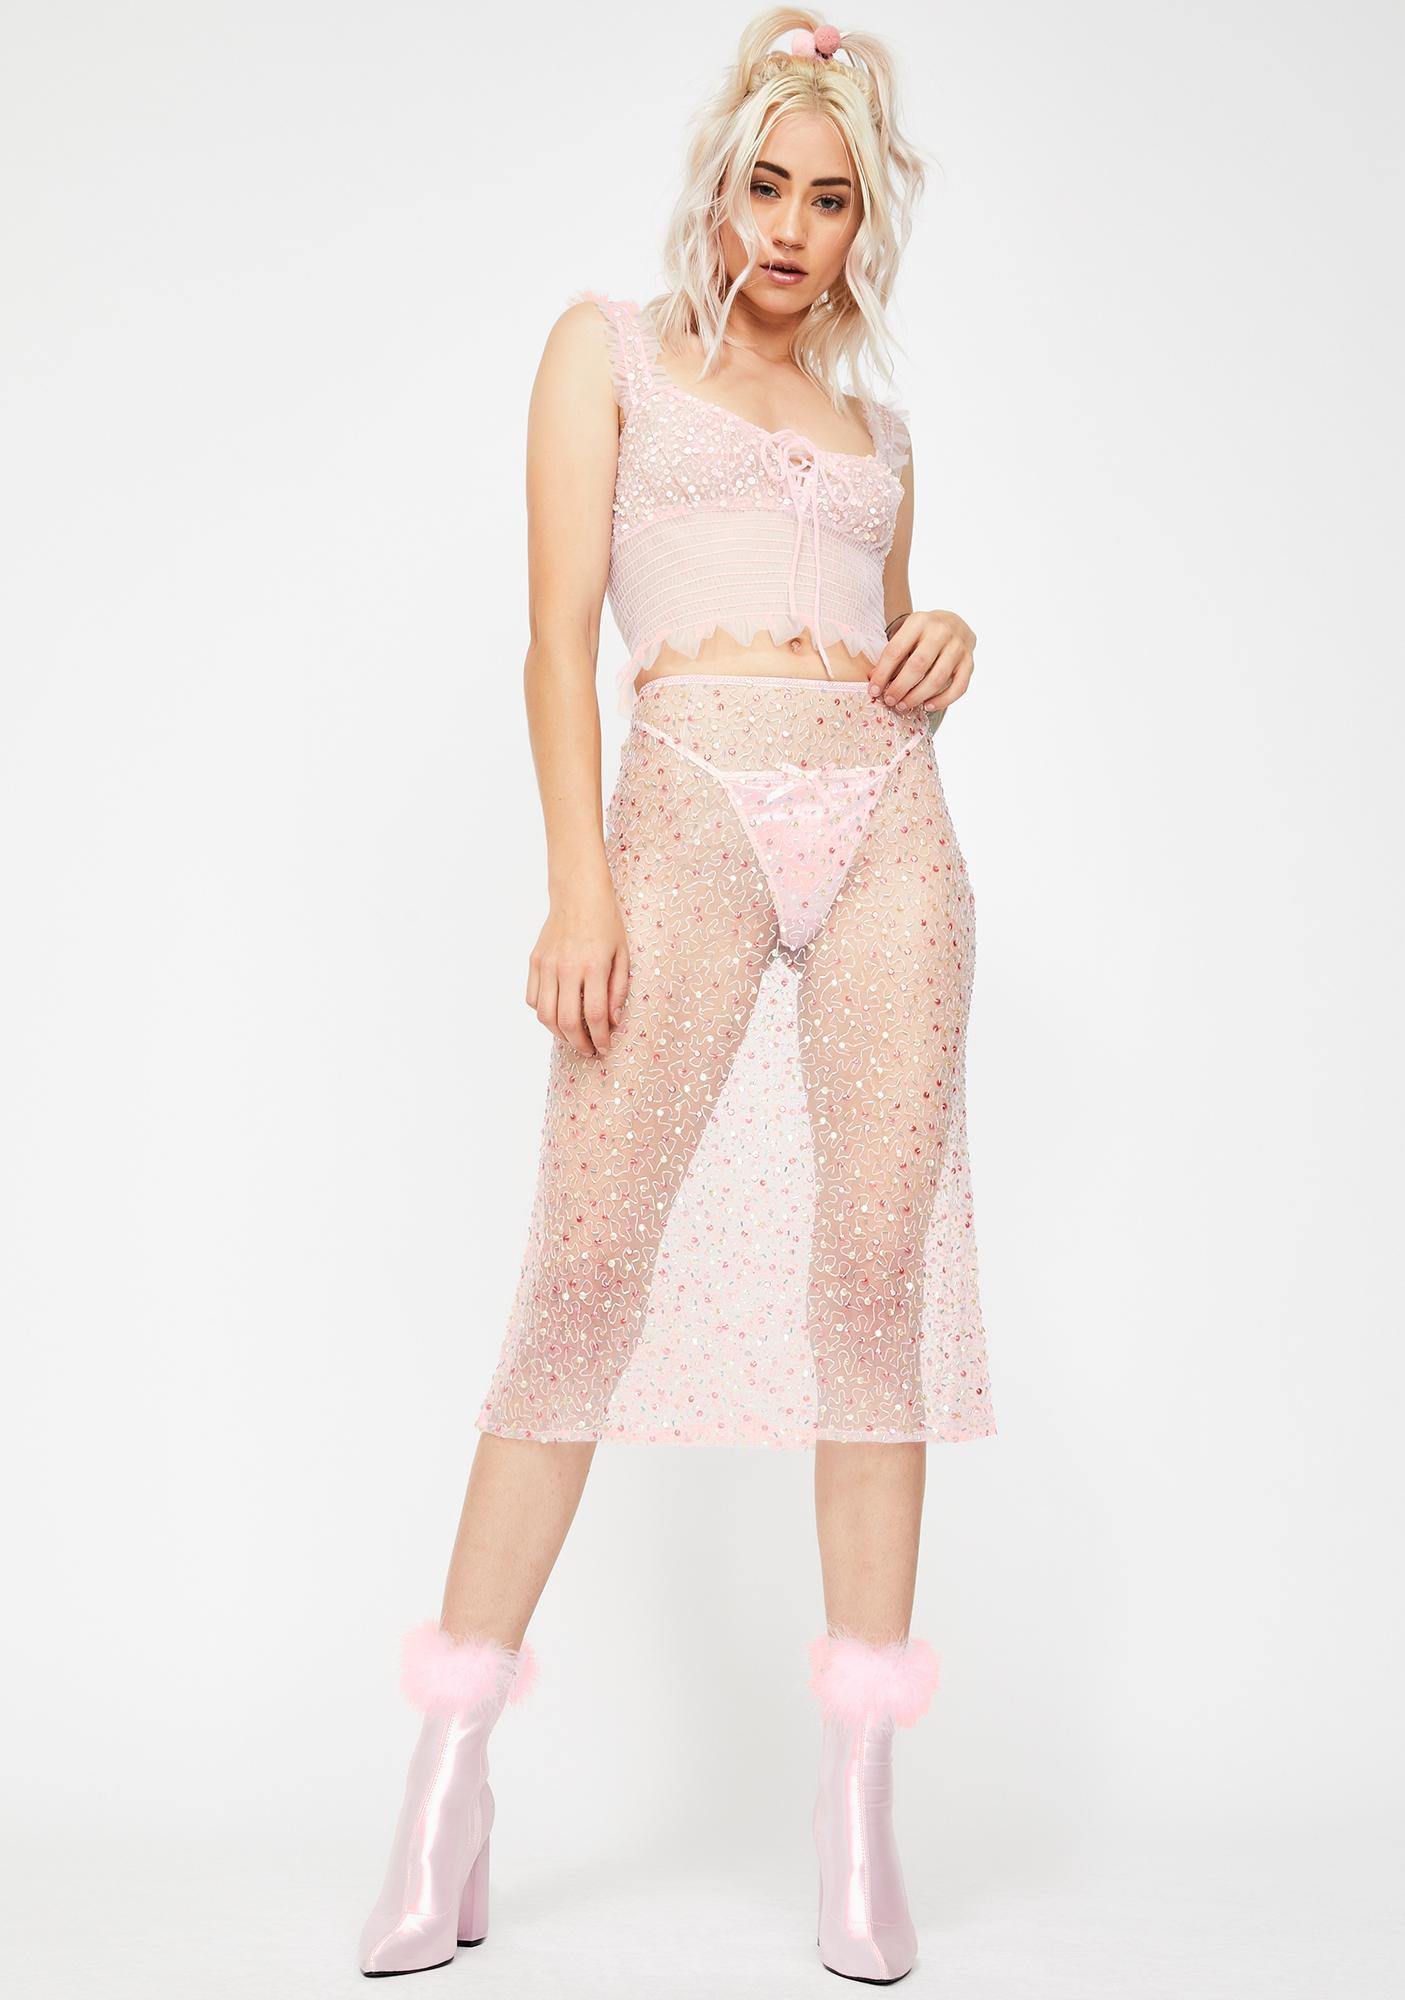 Dyspnea Down With The Patriassy Midi Skirt